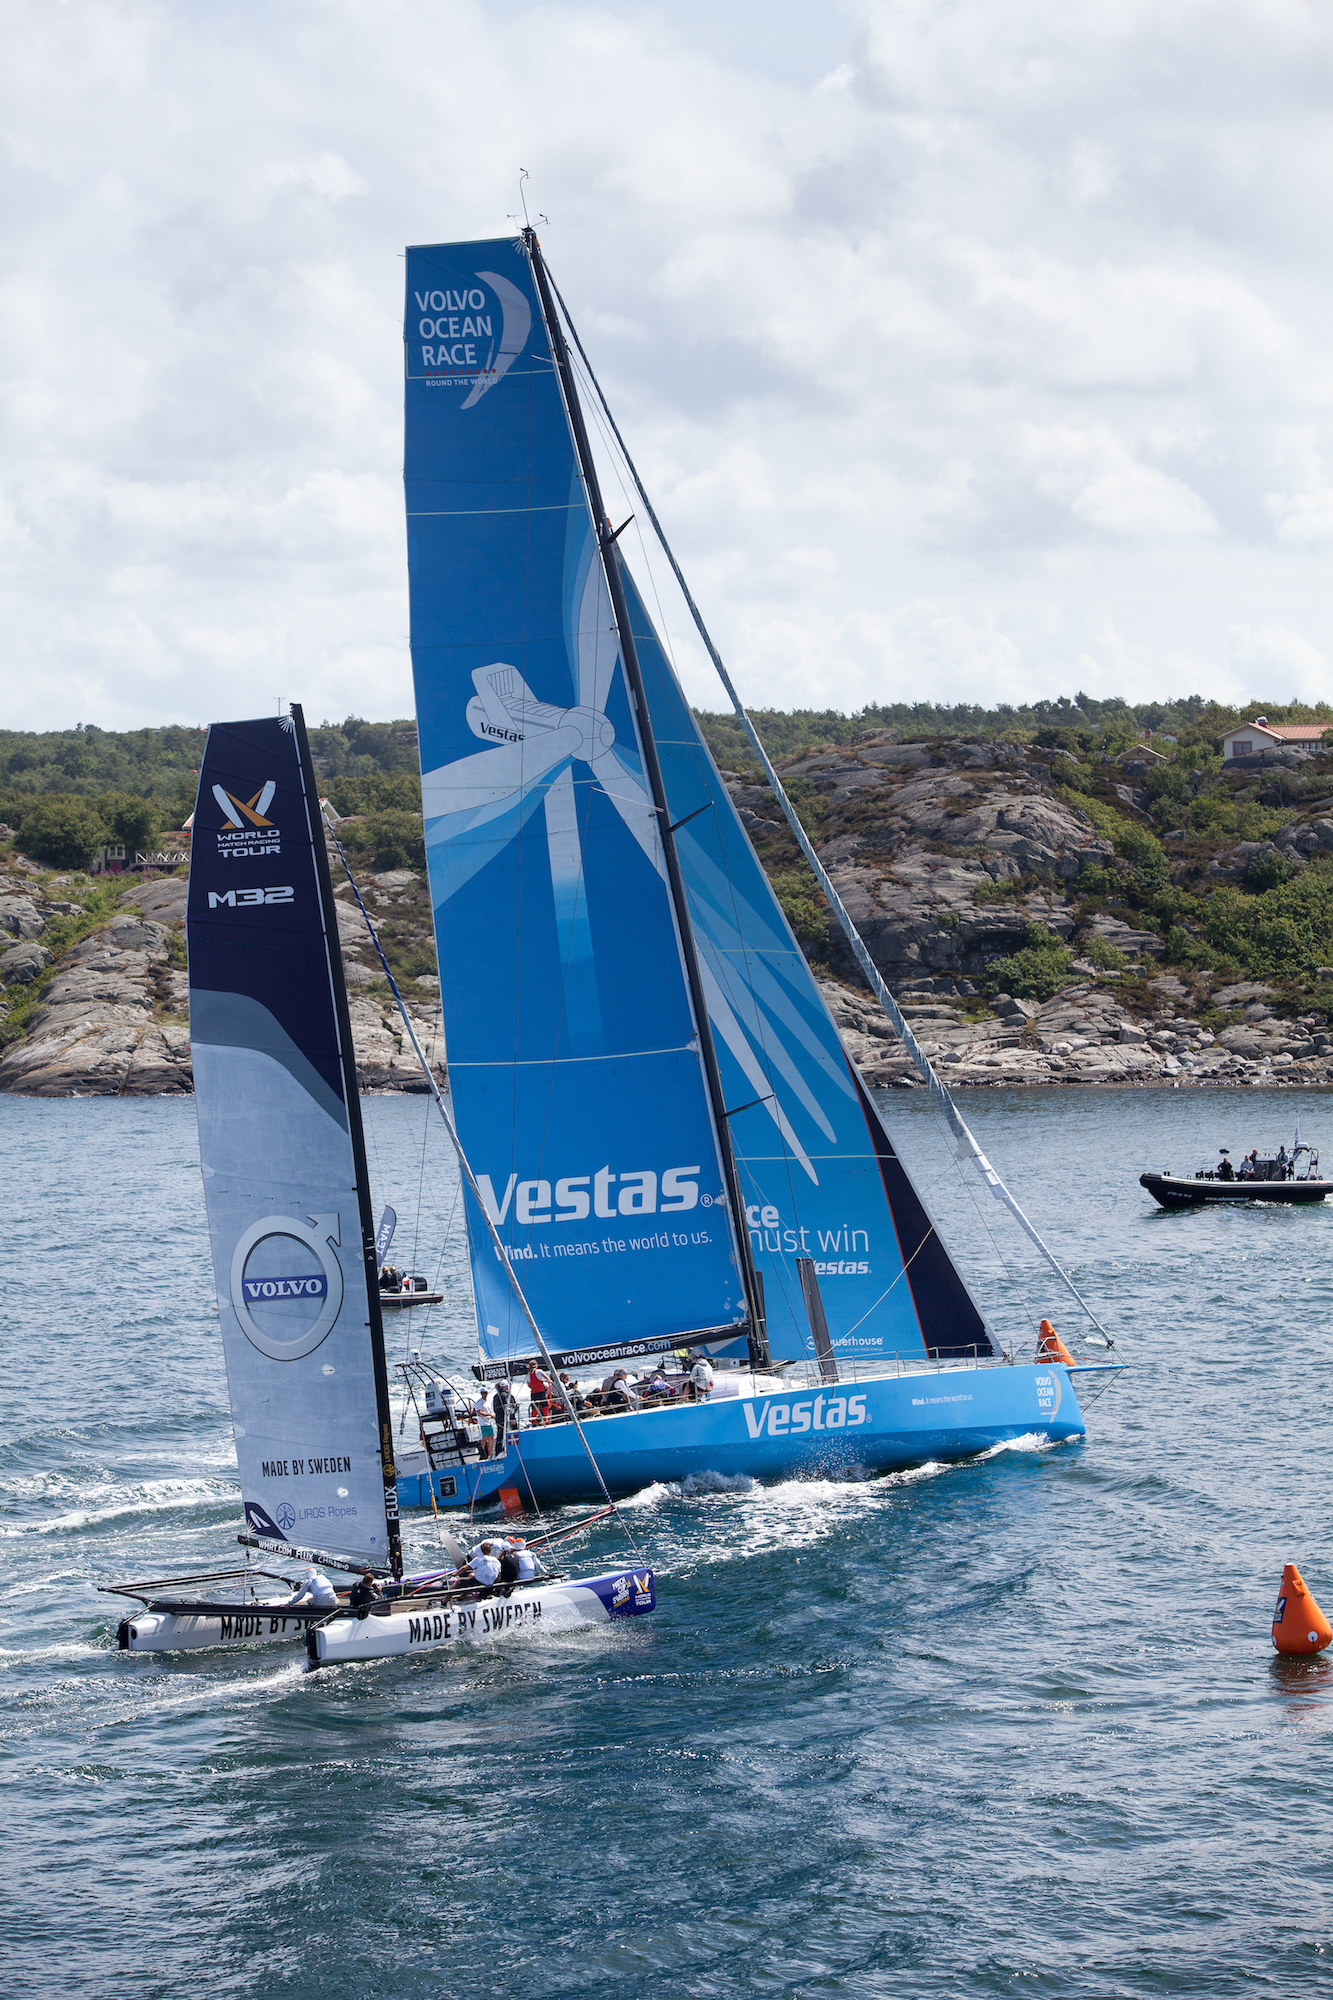 Each team will get a M32 catamaran for guest racing during the Volvo Ocean Race. Photo WMRT.